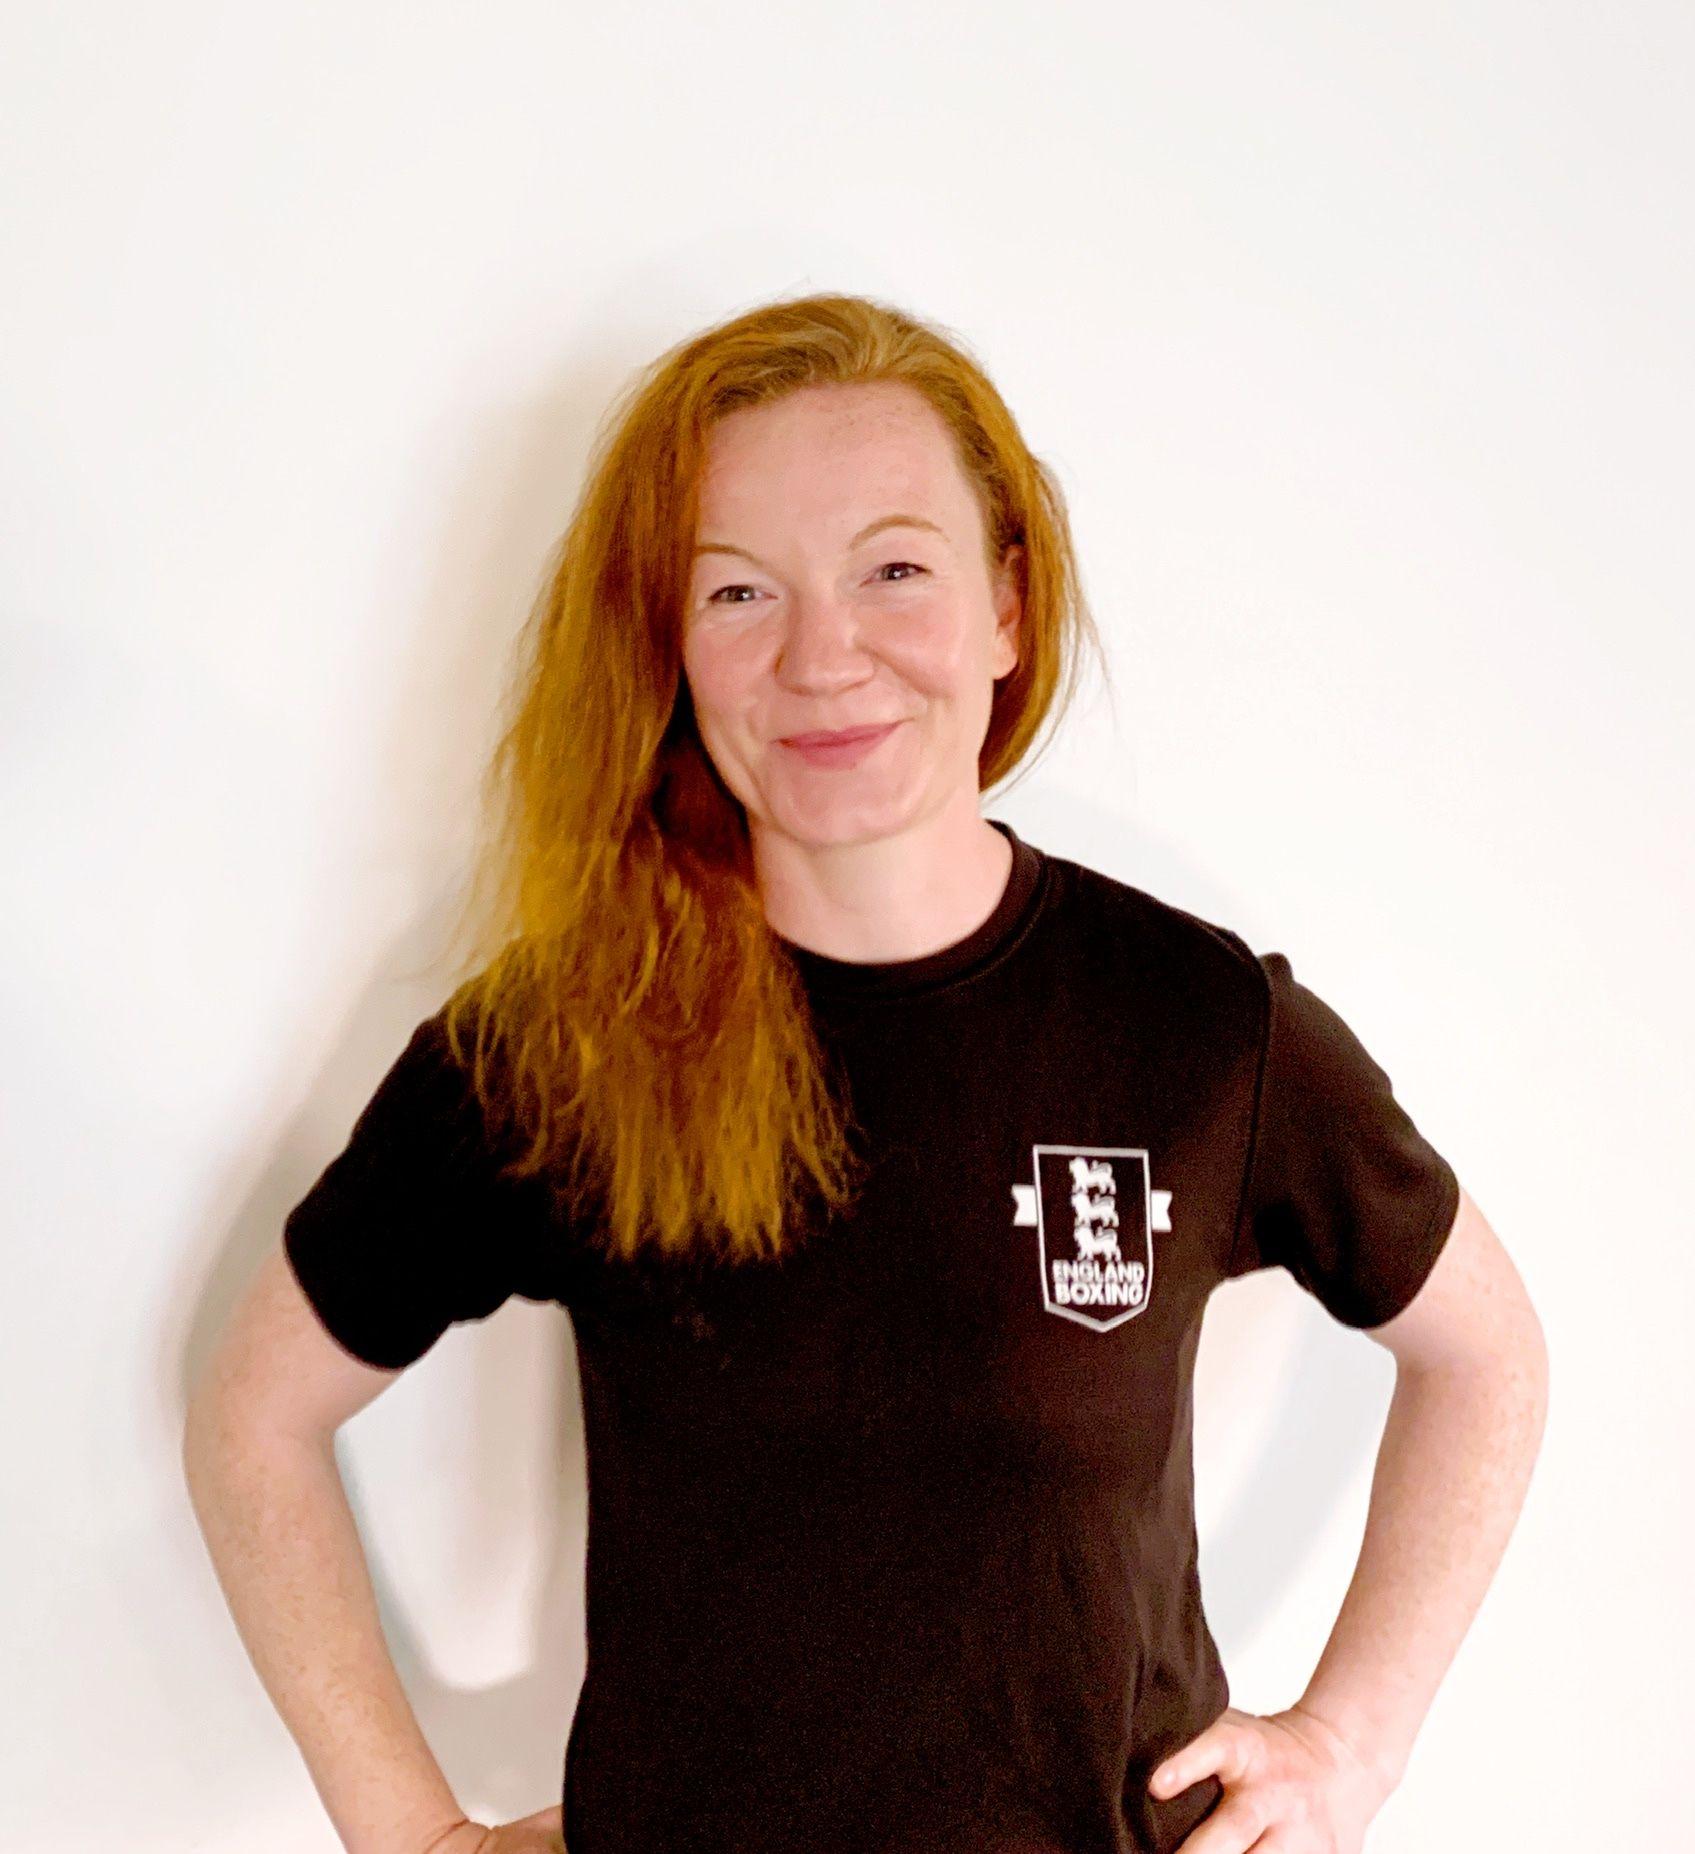 Rachael-Mackenzie-Work-Athlete